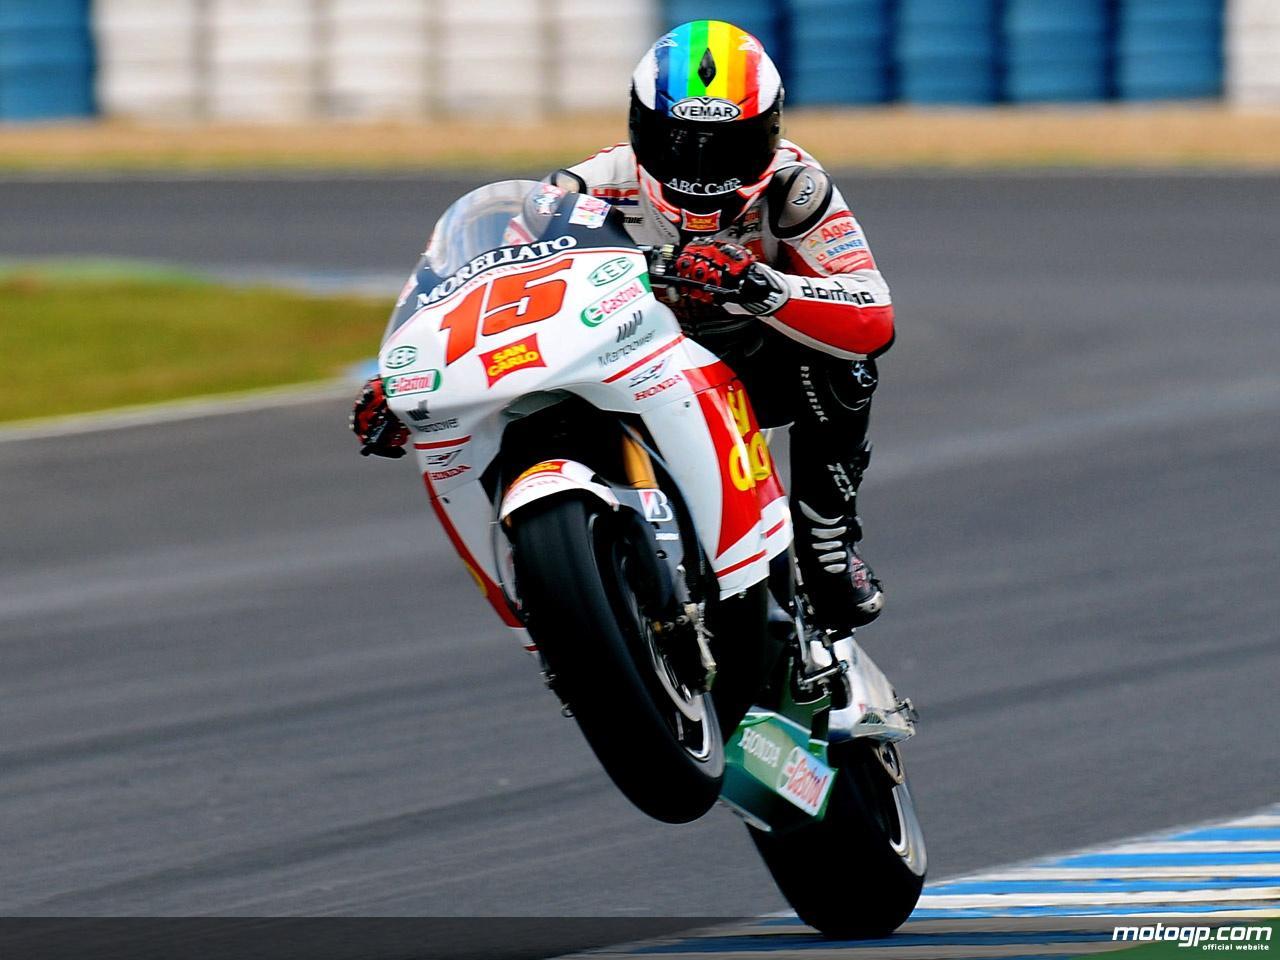 n495800_236333_Alex+de+Angelis+in+MotoGP+test+in+Jerez-1280x960-nov27.jpg._original.original.jpg